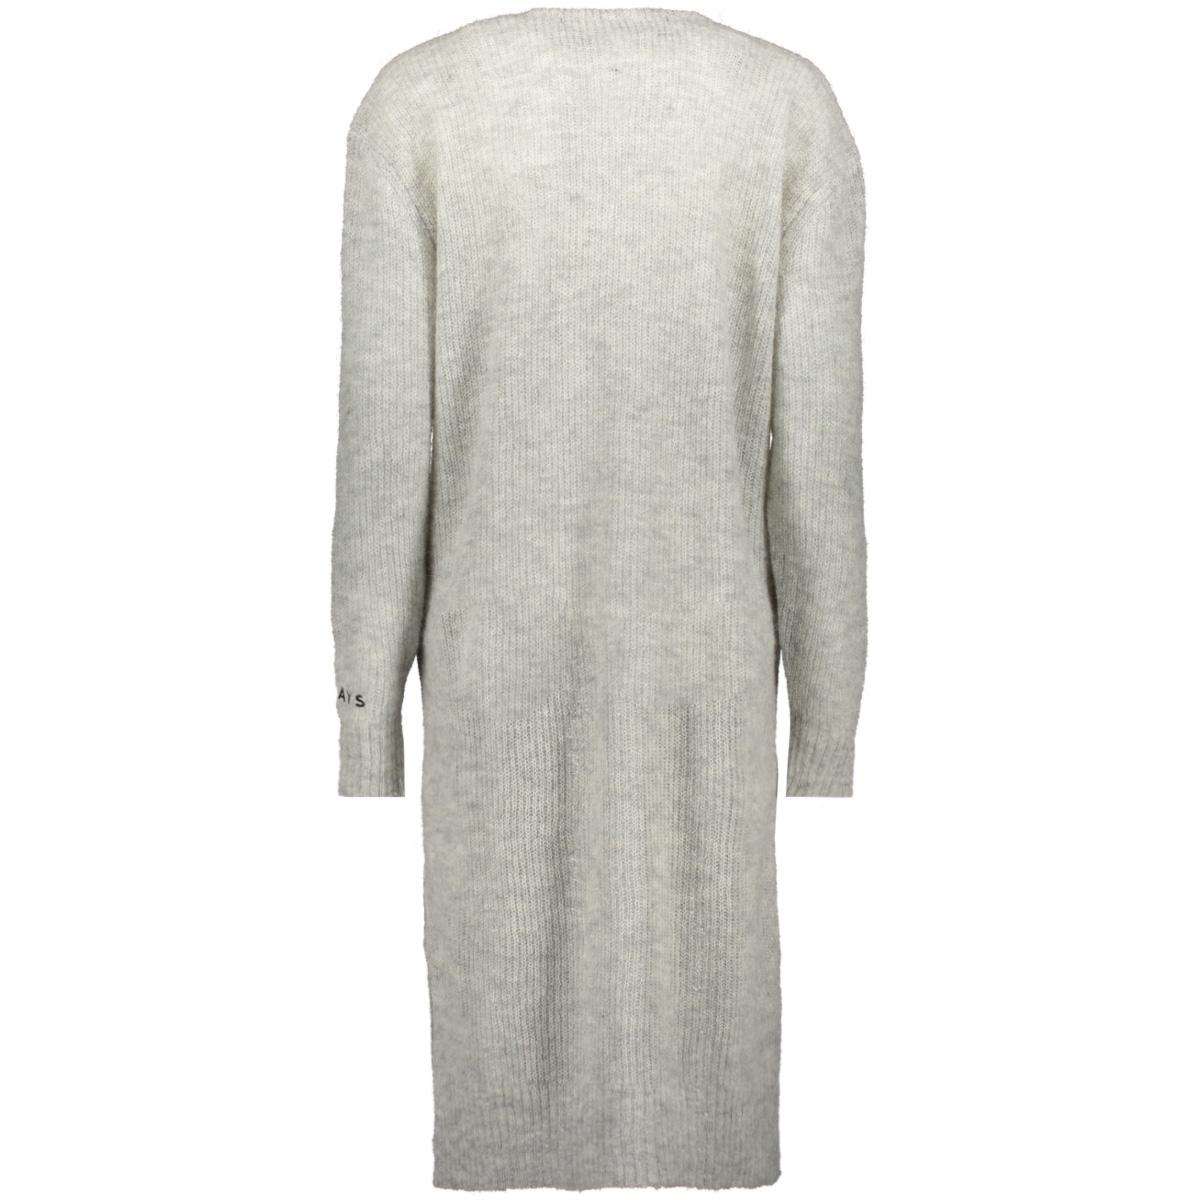 cardigan alpaca merino 20 661 9103 10 days vest light grey melee